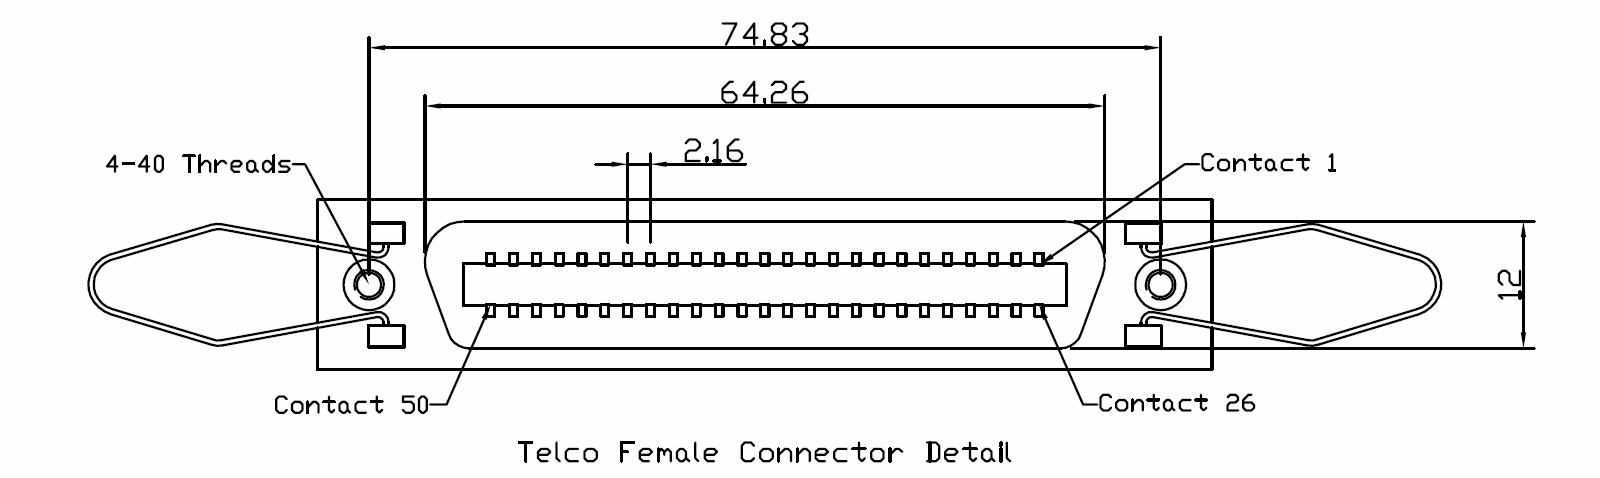 Telco Female Connector